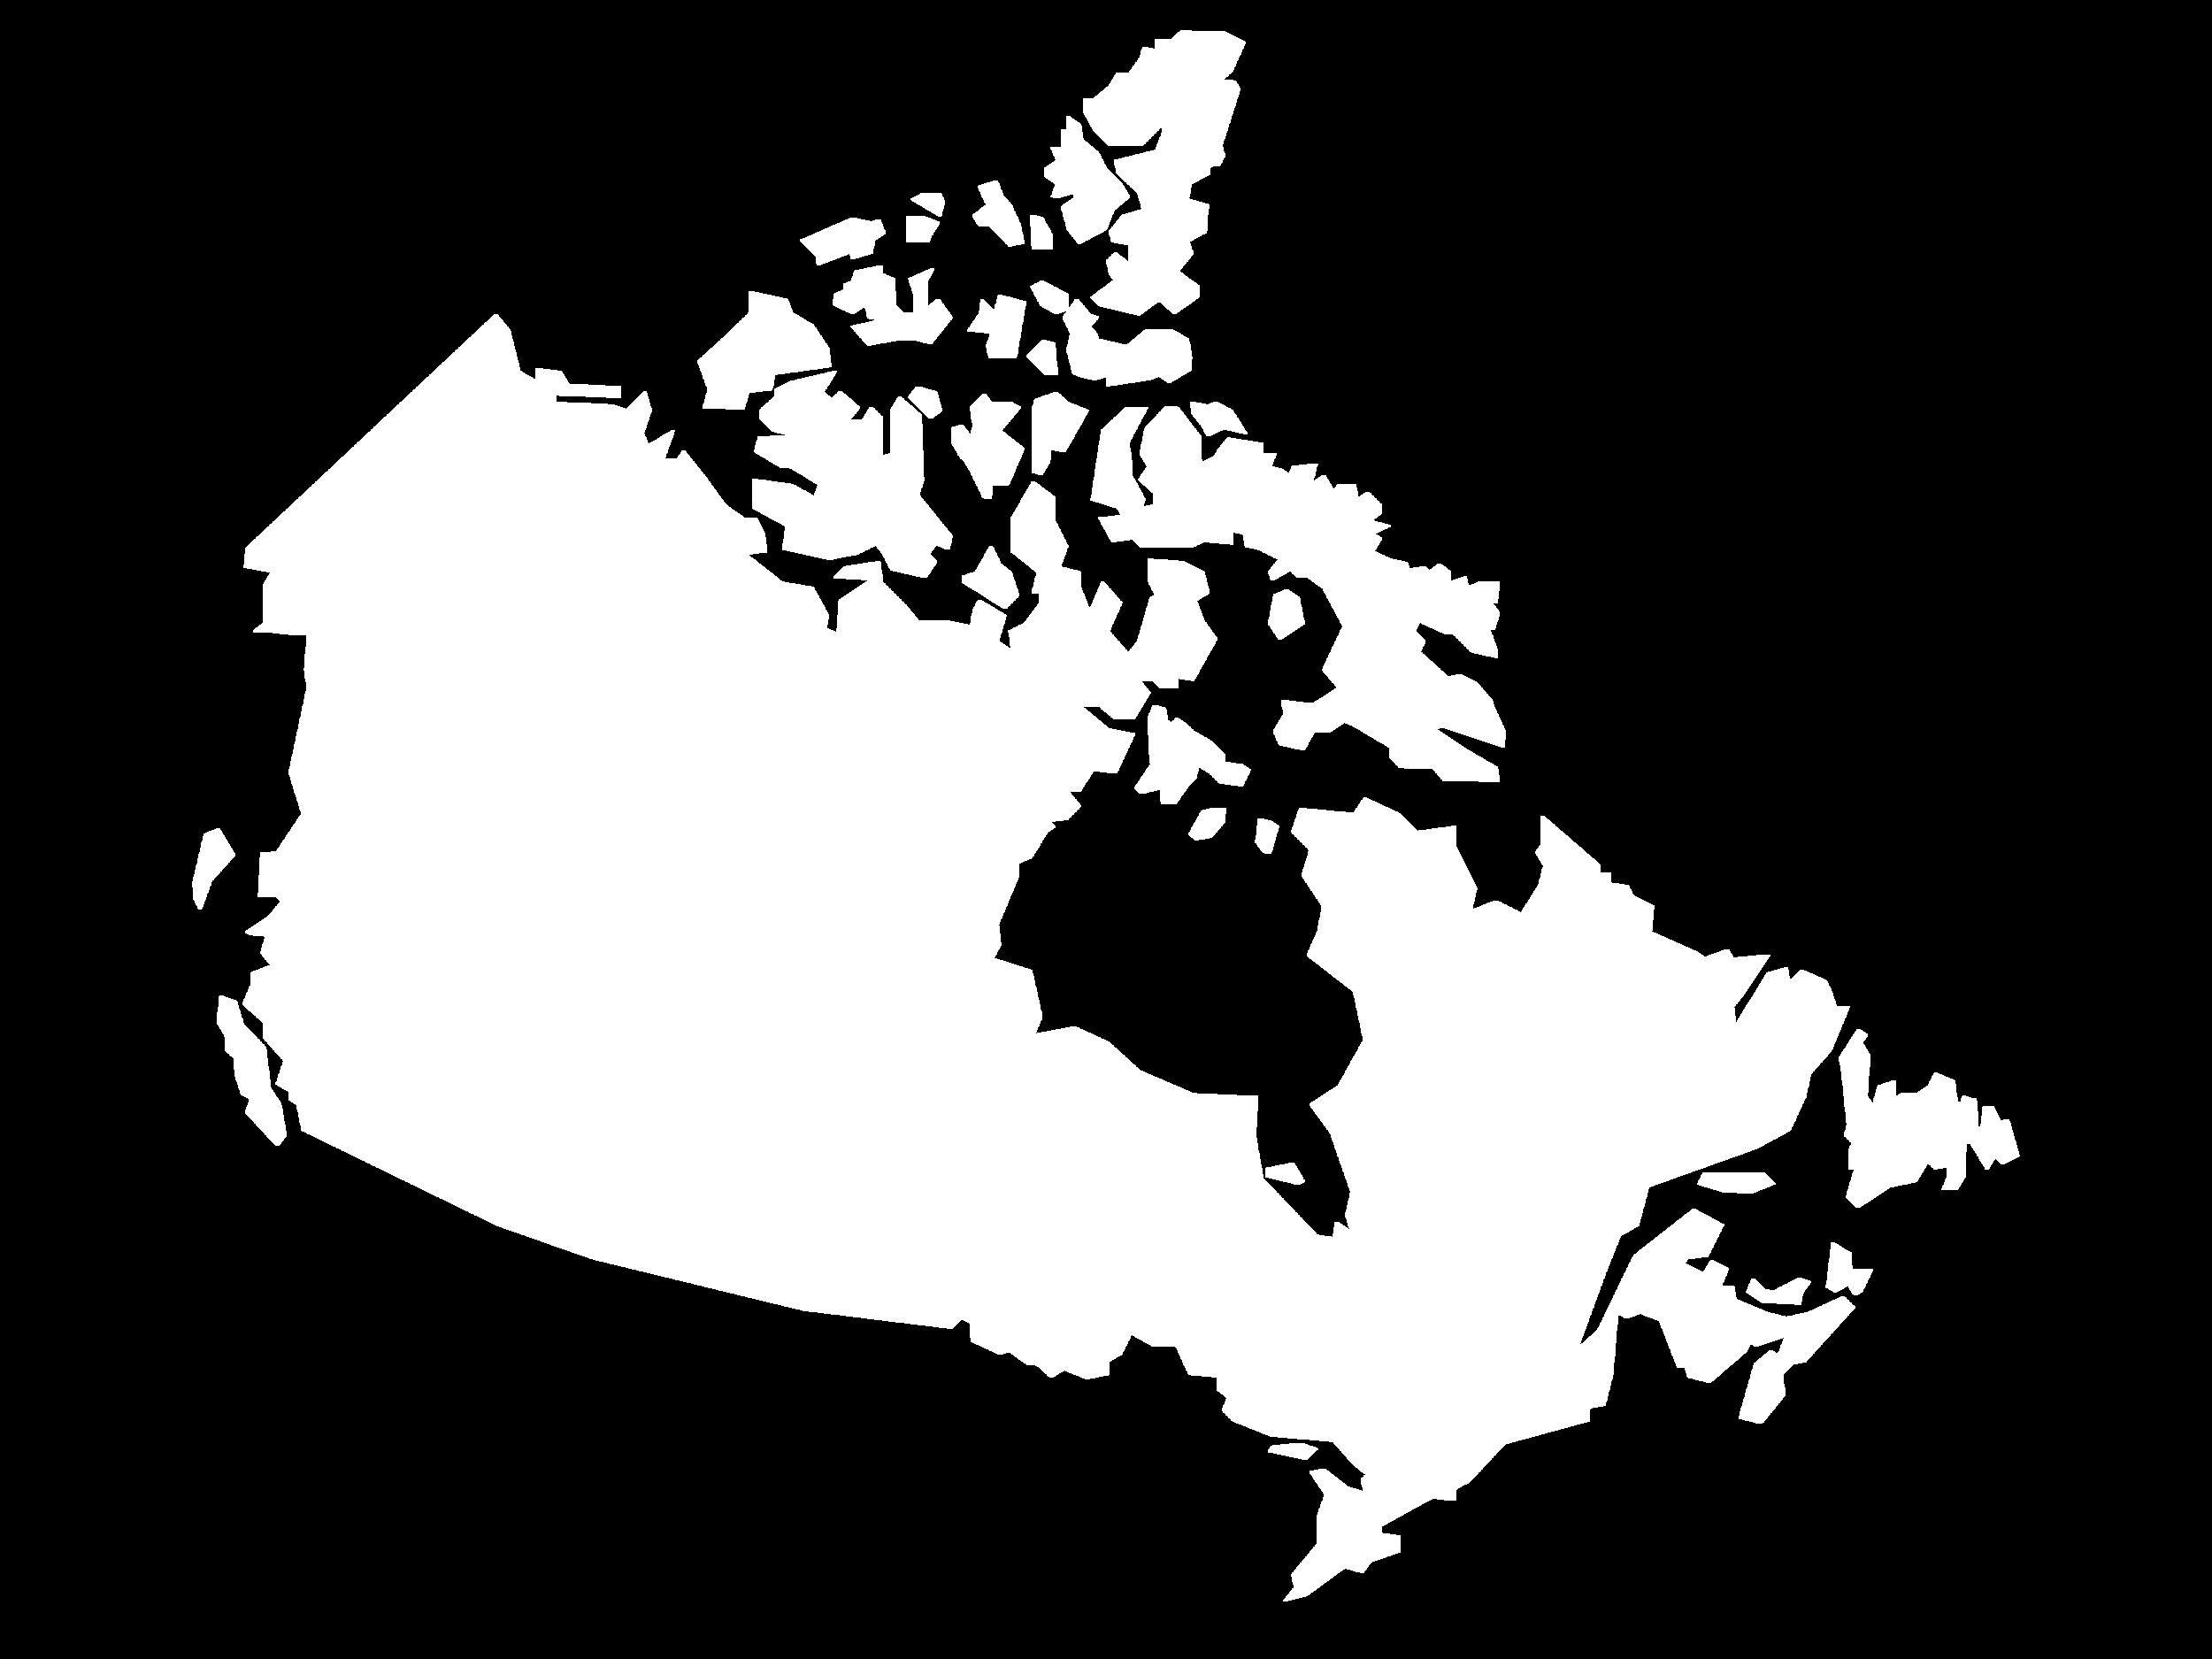 CanadaMap.png